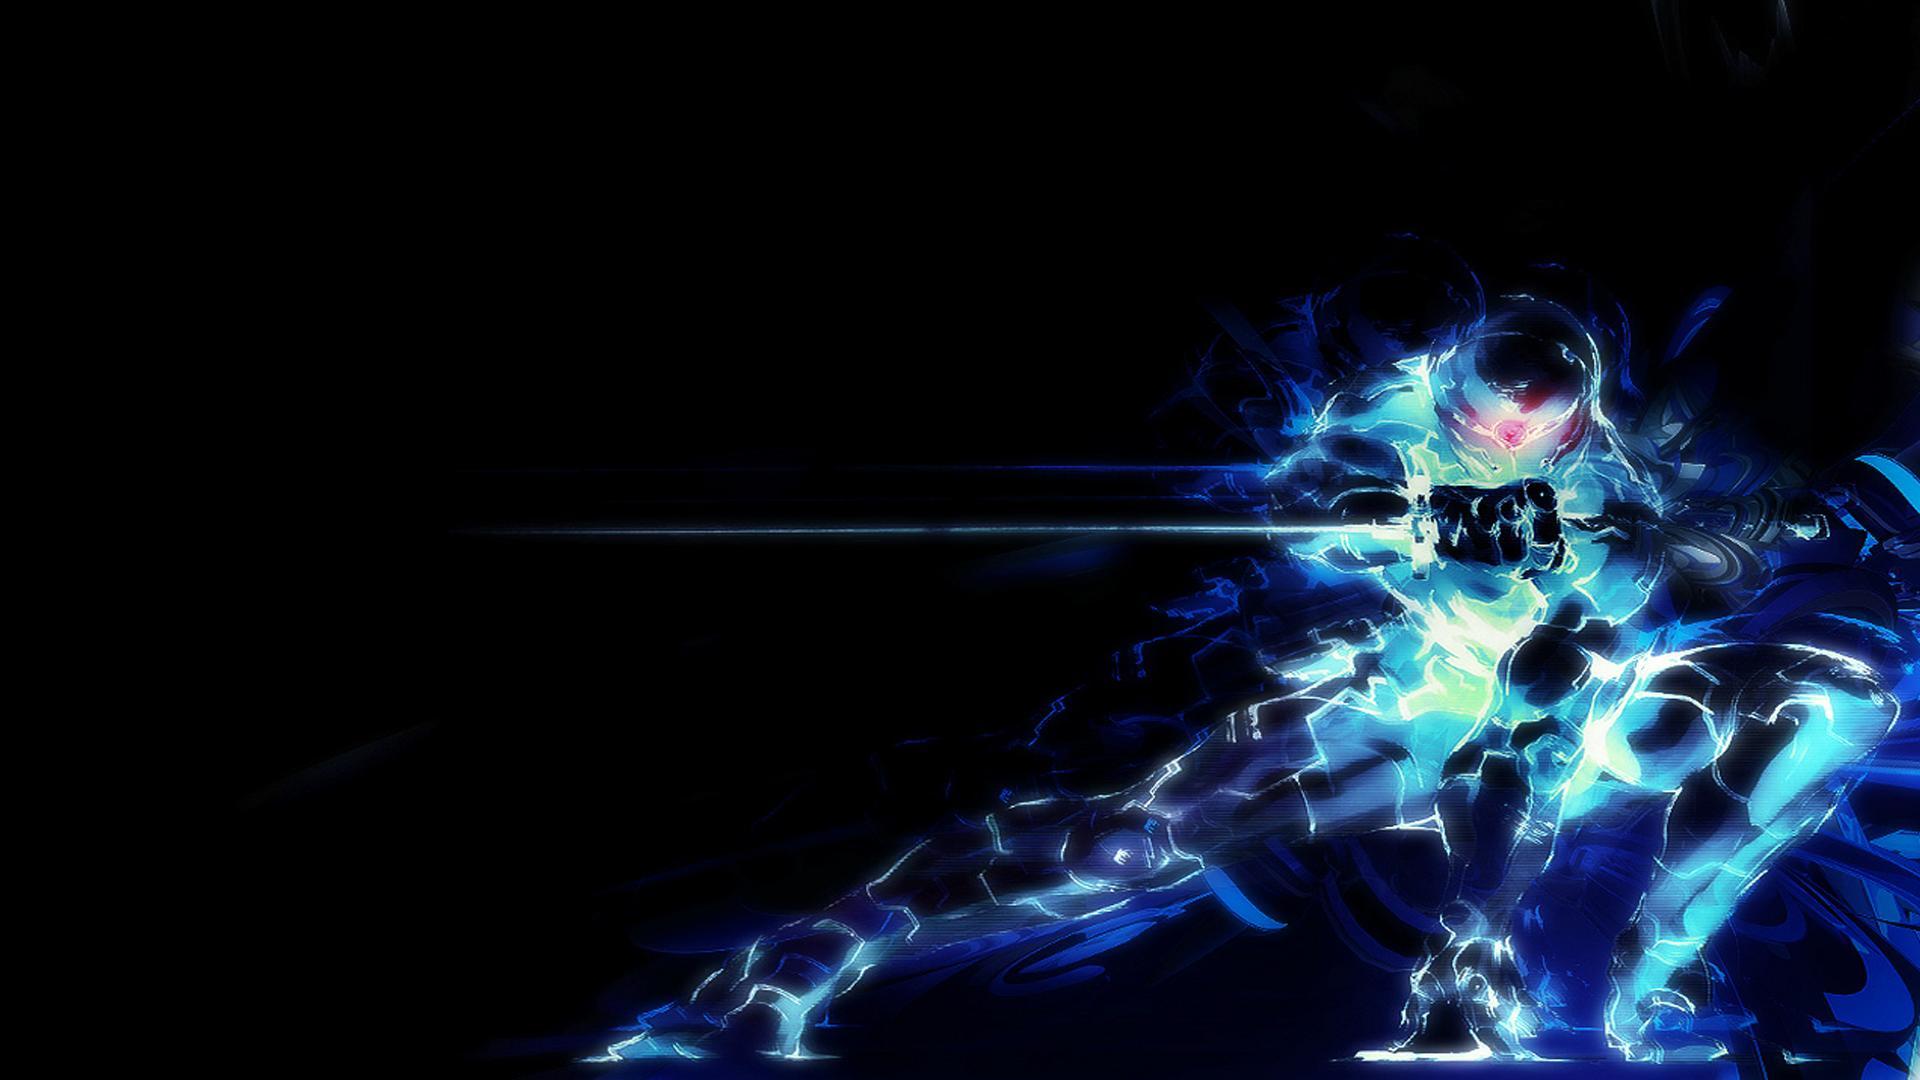 mgs-cyborg-ninja-1920%C3%971080-wallpaper-wpc9001378